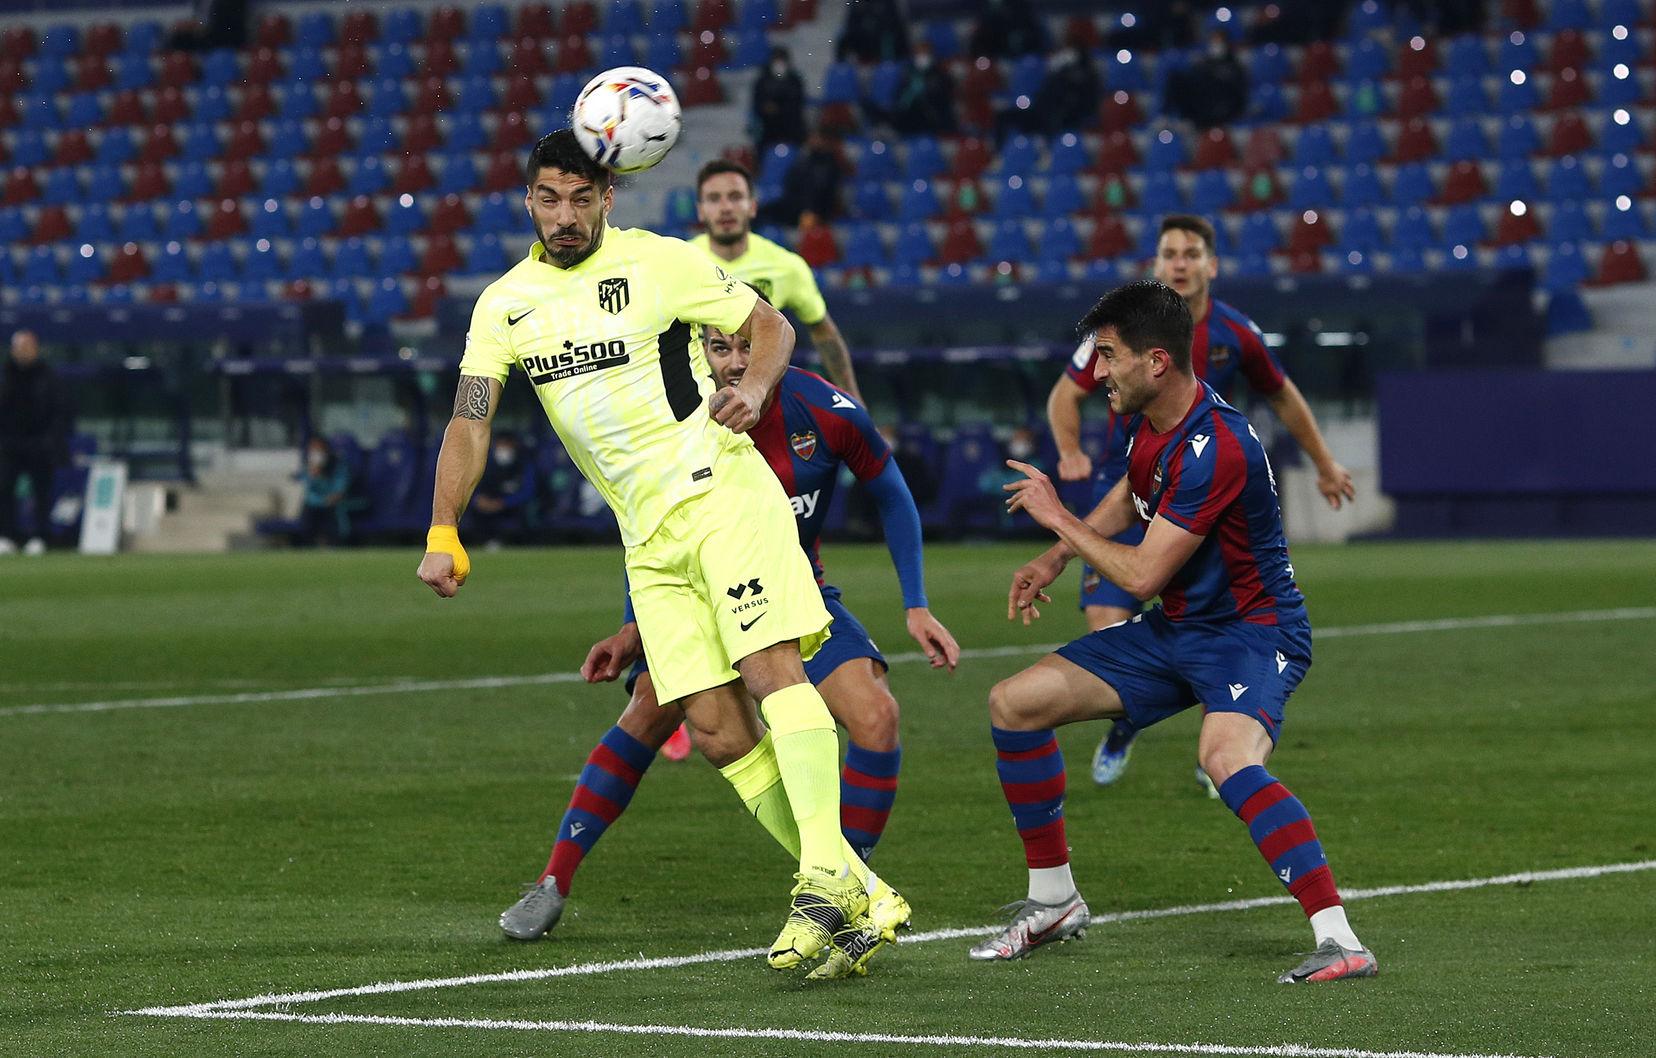 Прімера. Перенесений матч 2-го туру. Атлетико втрачає очки на полі Леванте - изображение 1